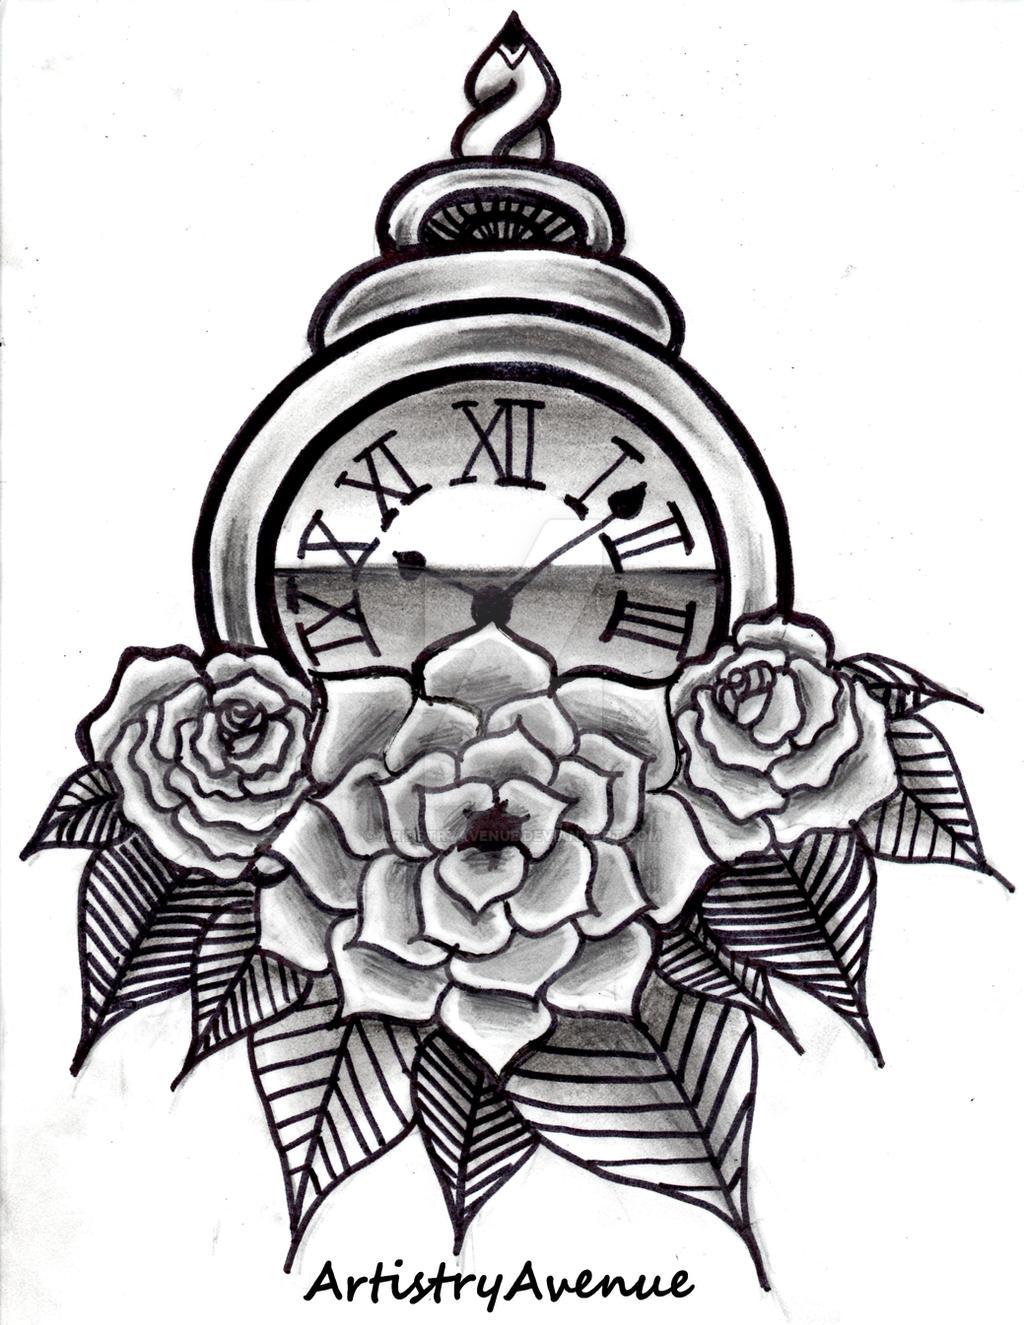 roman numeral watch tattoo design by artistryavenue on deviantart. Black Bedroom Furniture Sets. Home Design Ideas